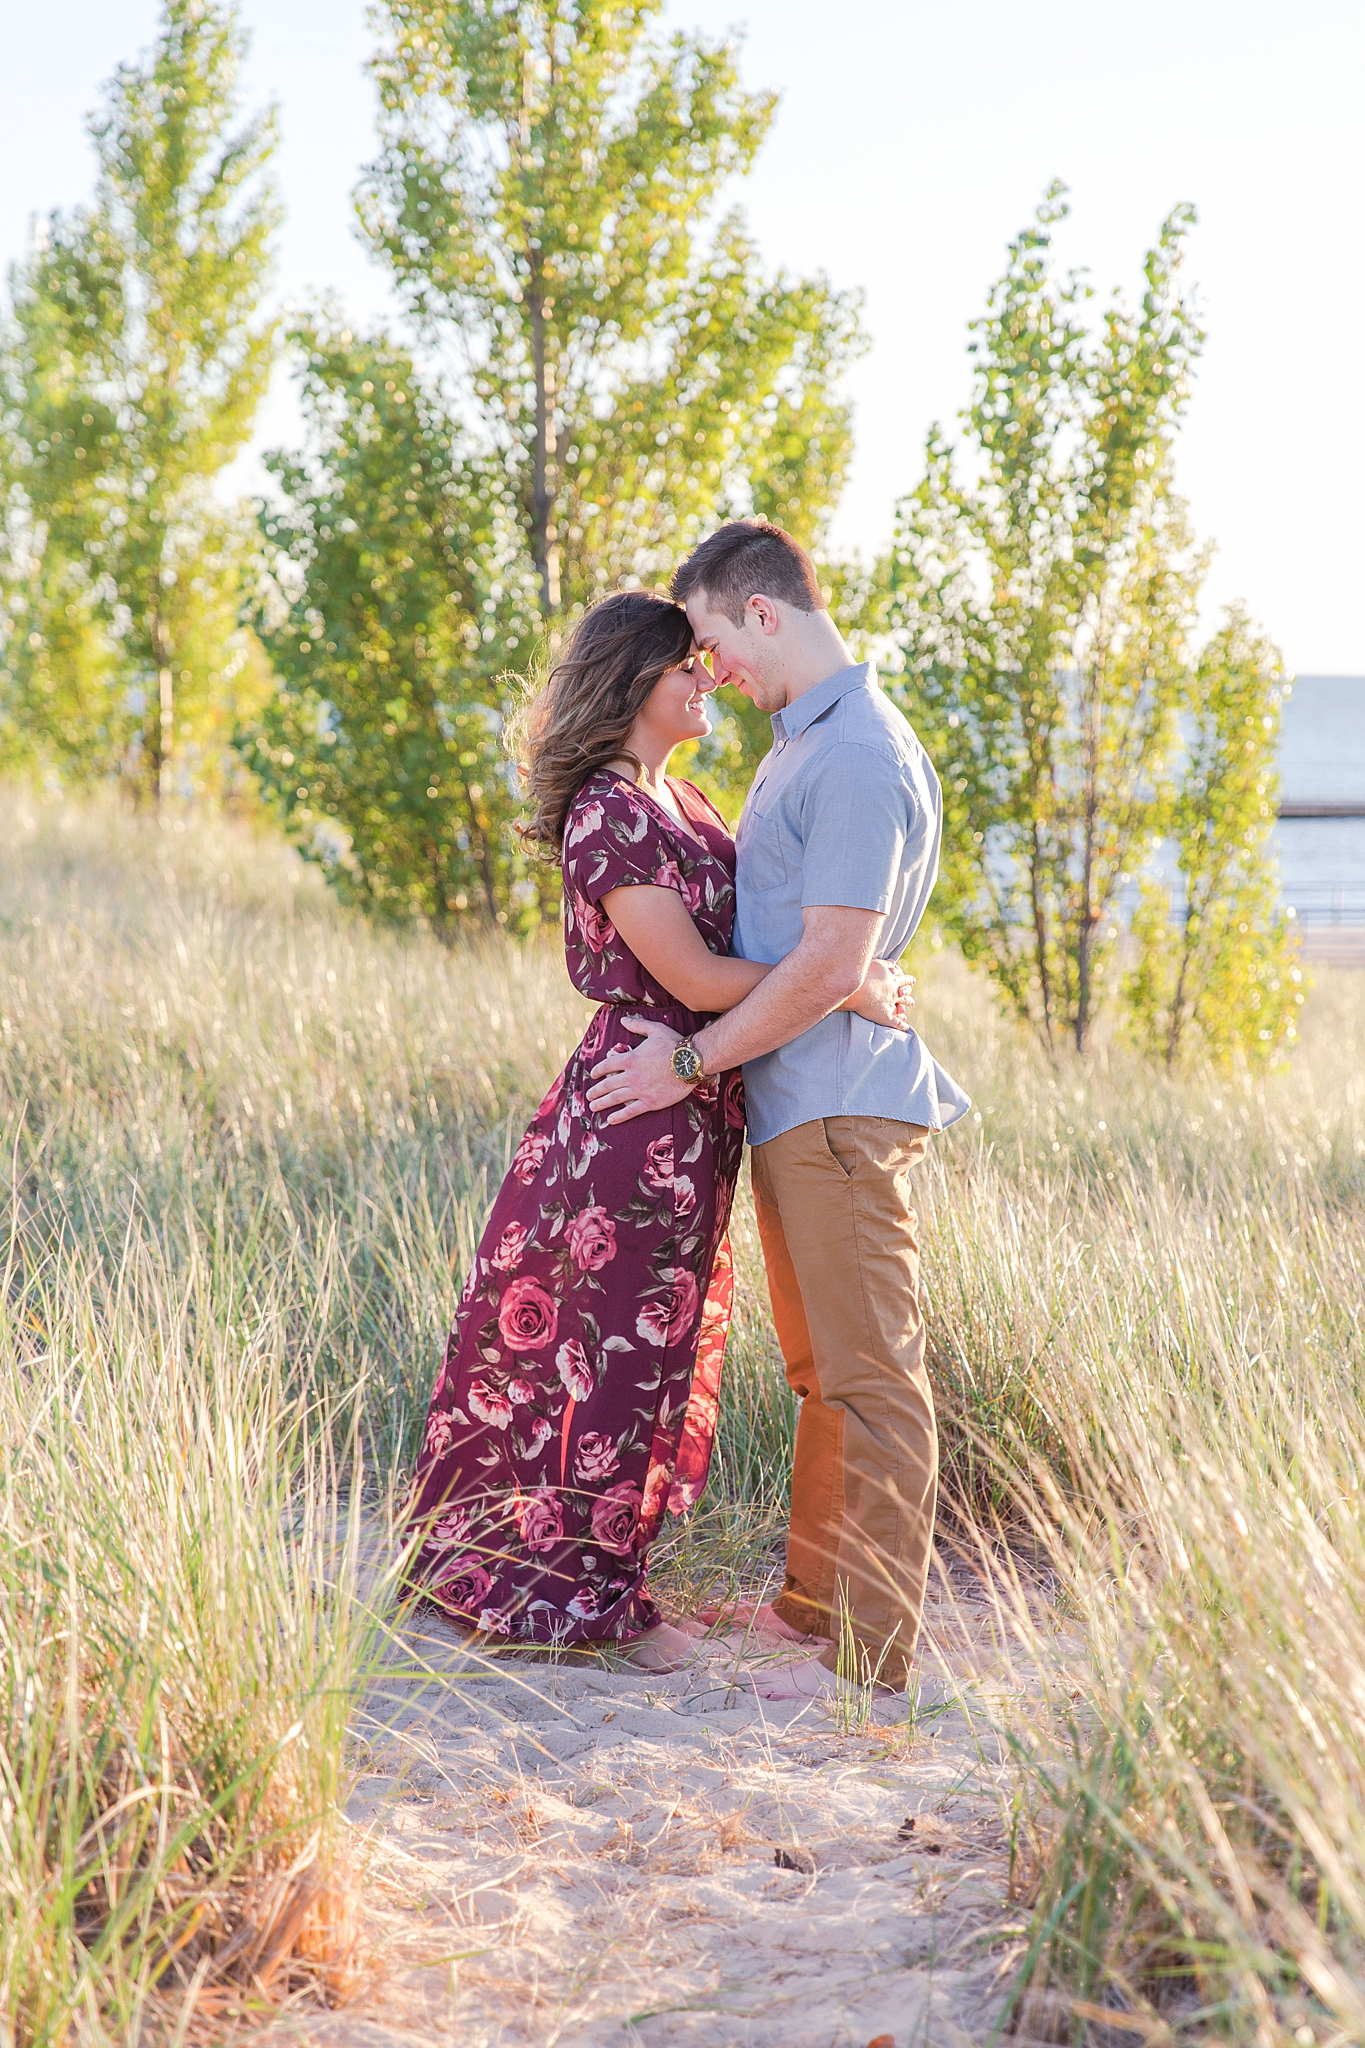 romantic--summer-beach-engagement-photography-in-st-joseph-mi-by-courtney-carolyn-photography_0003.jpg